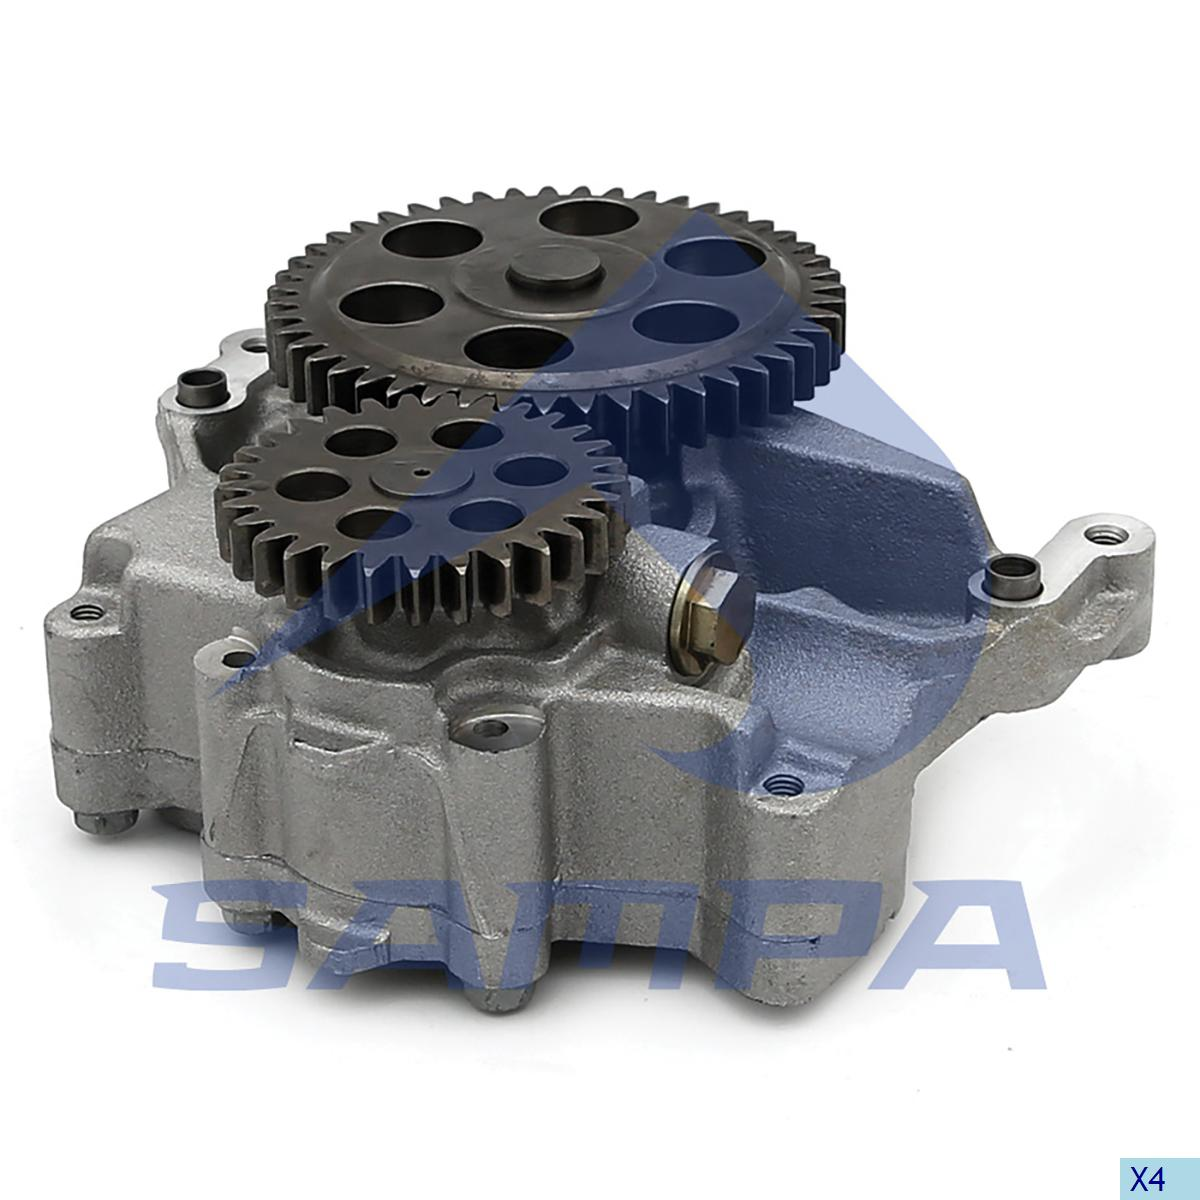 Oil Pump, R.V.I., Gear Box